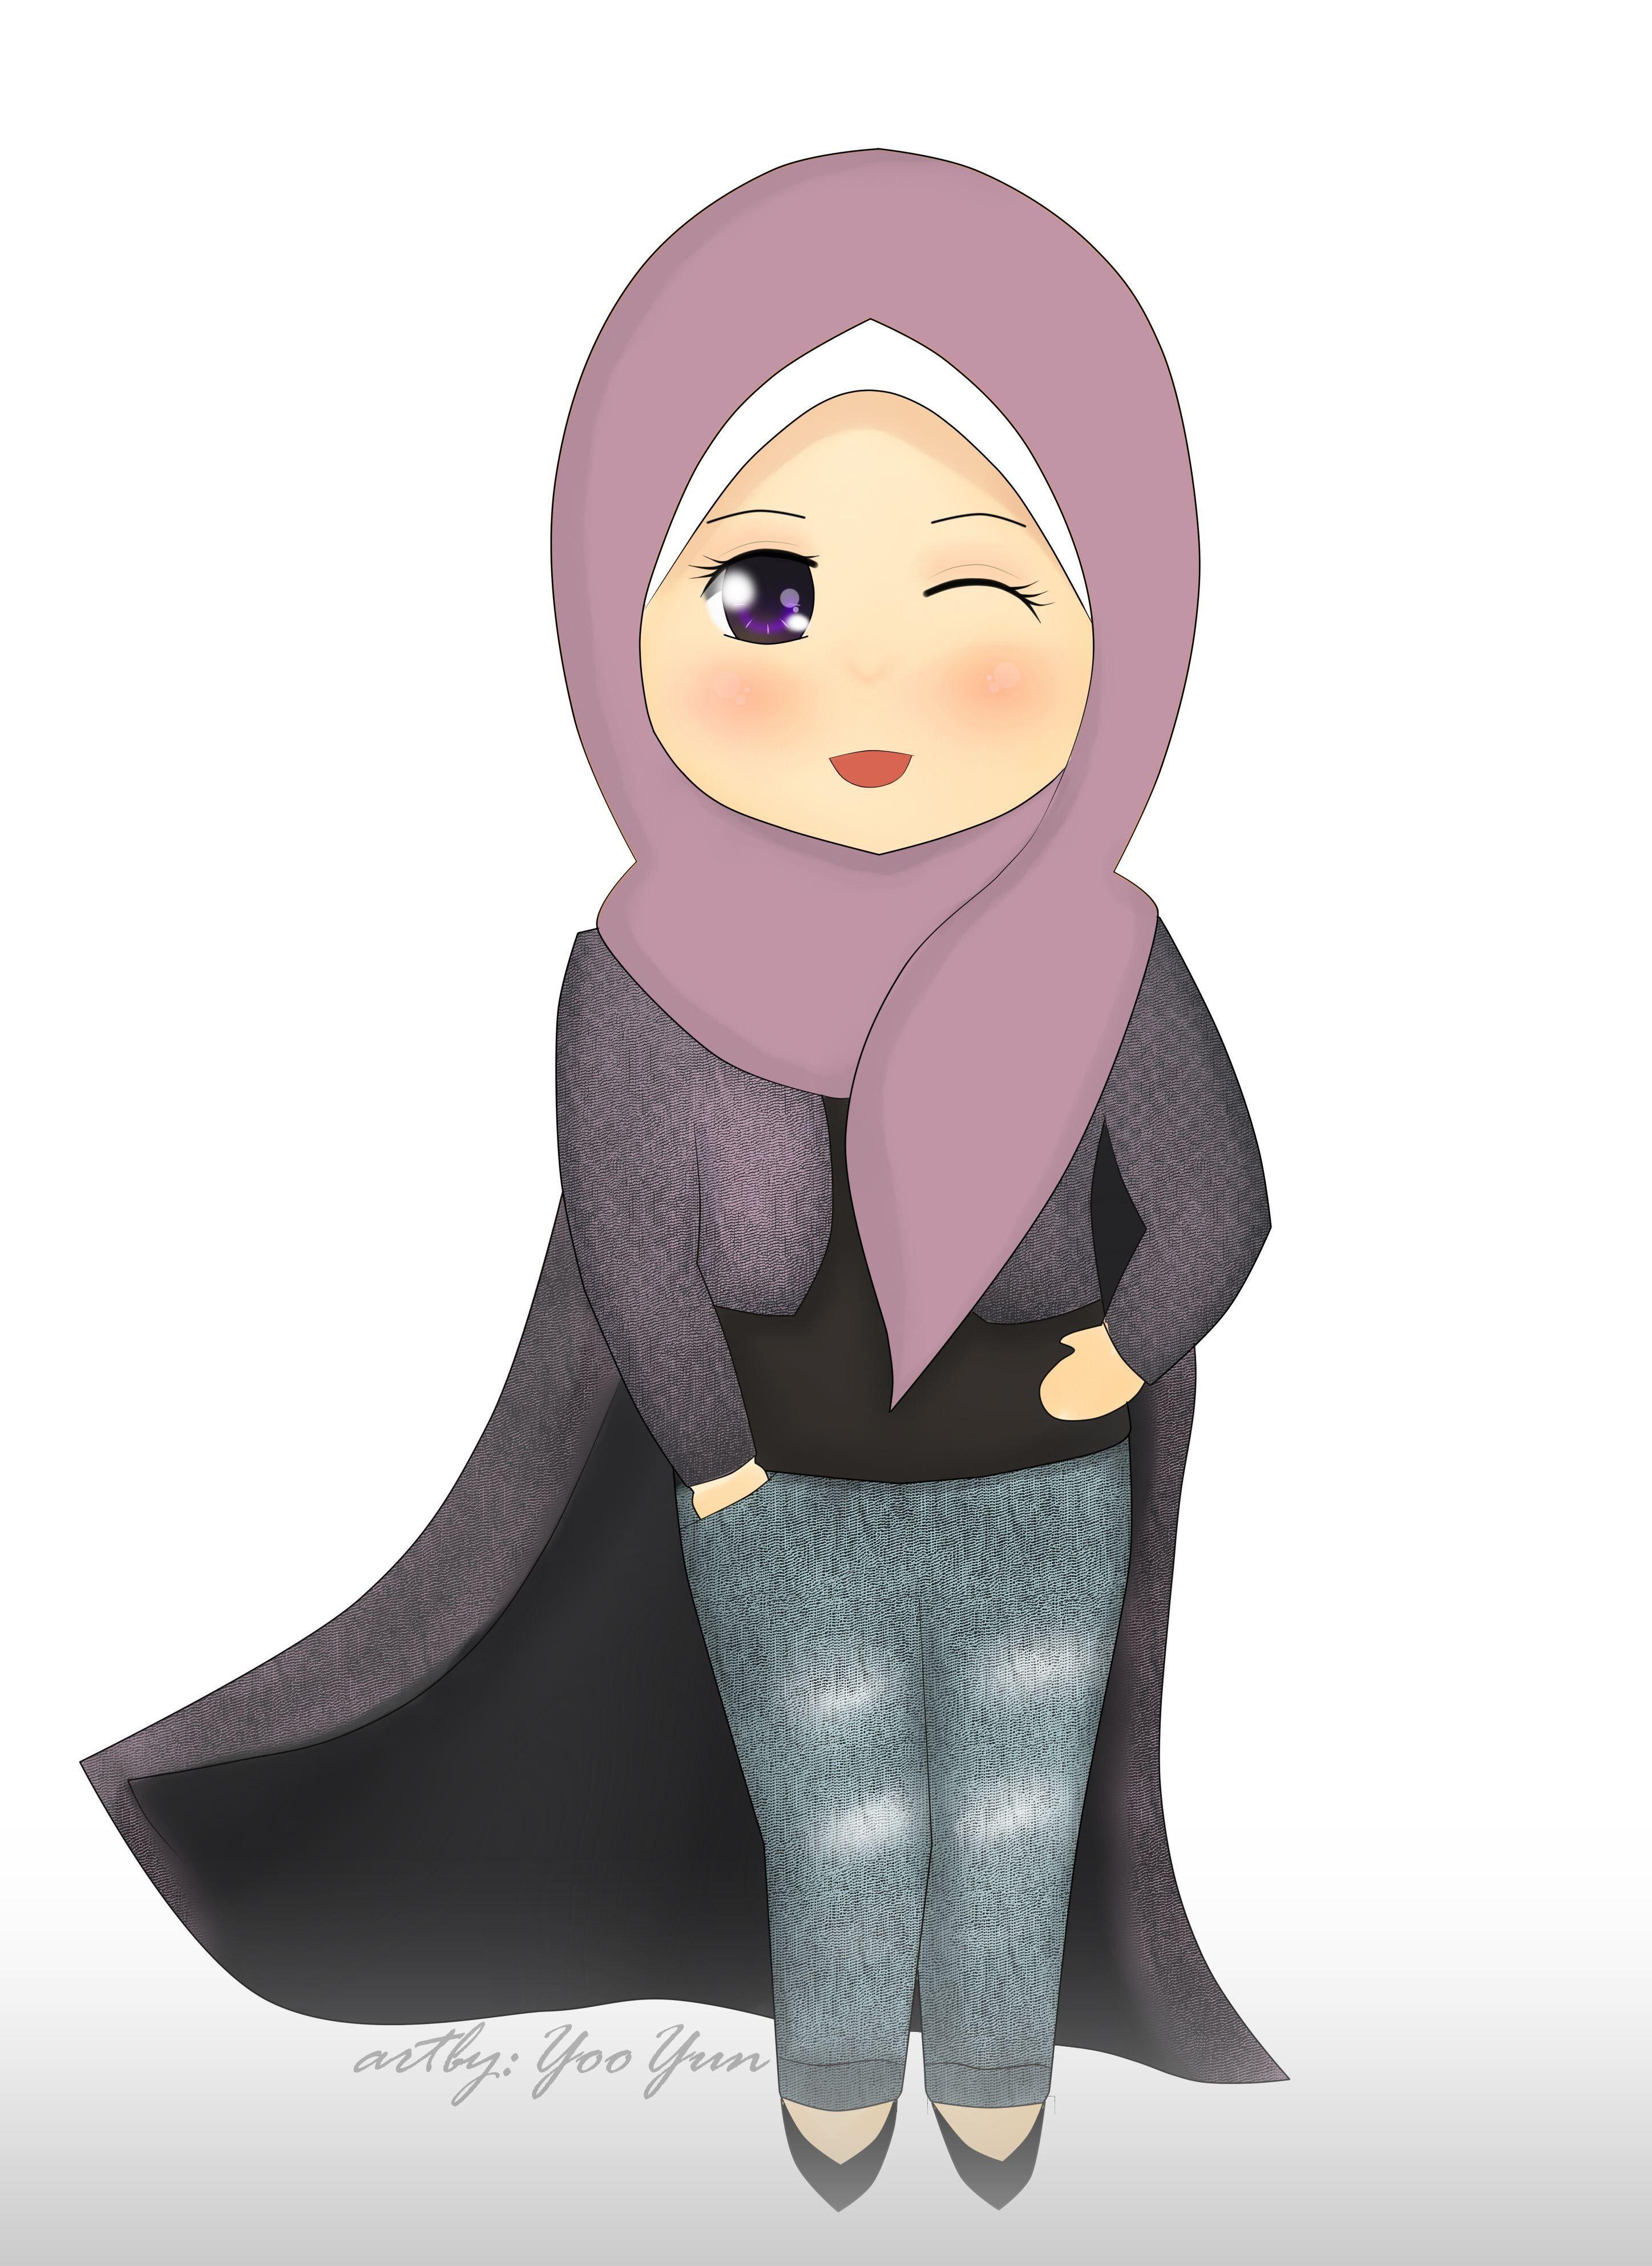 Mhia Rustam Blog Wallpaper Gadis Jilbab Muslimah Terbaru Pojok 41 Kartun Gambar Gambar Kartun